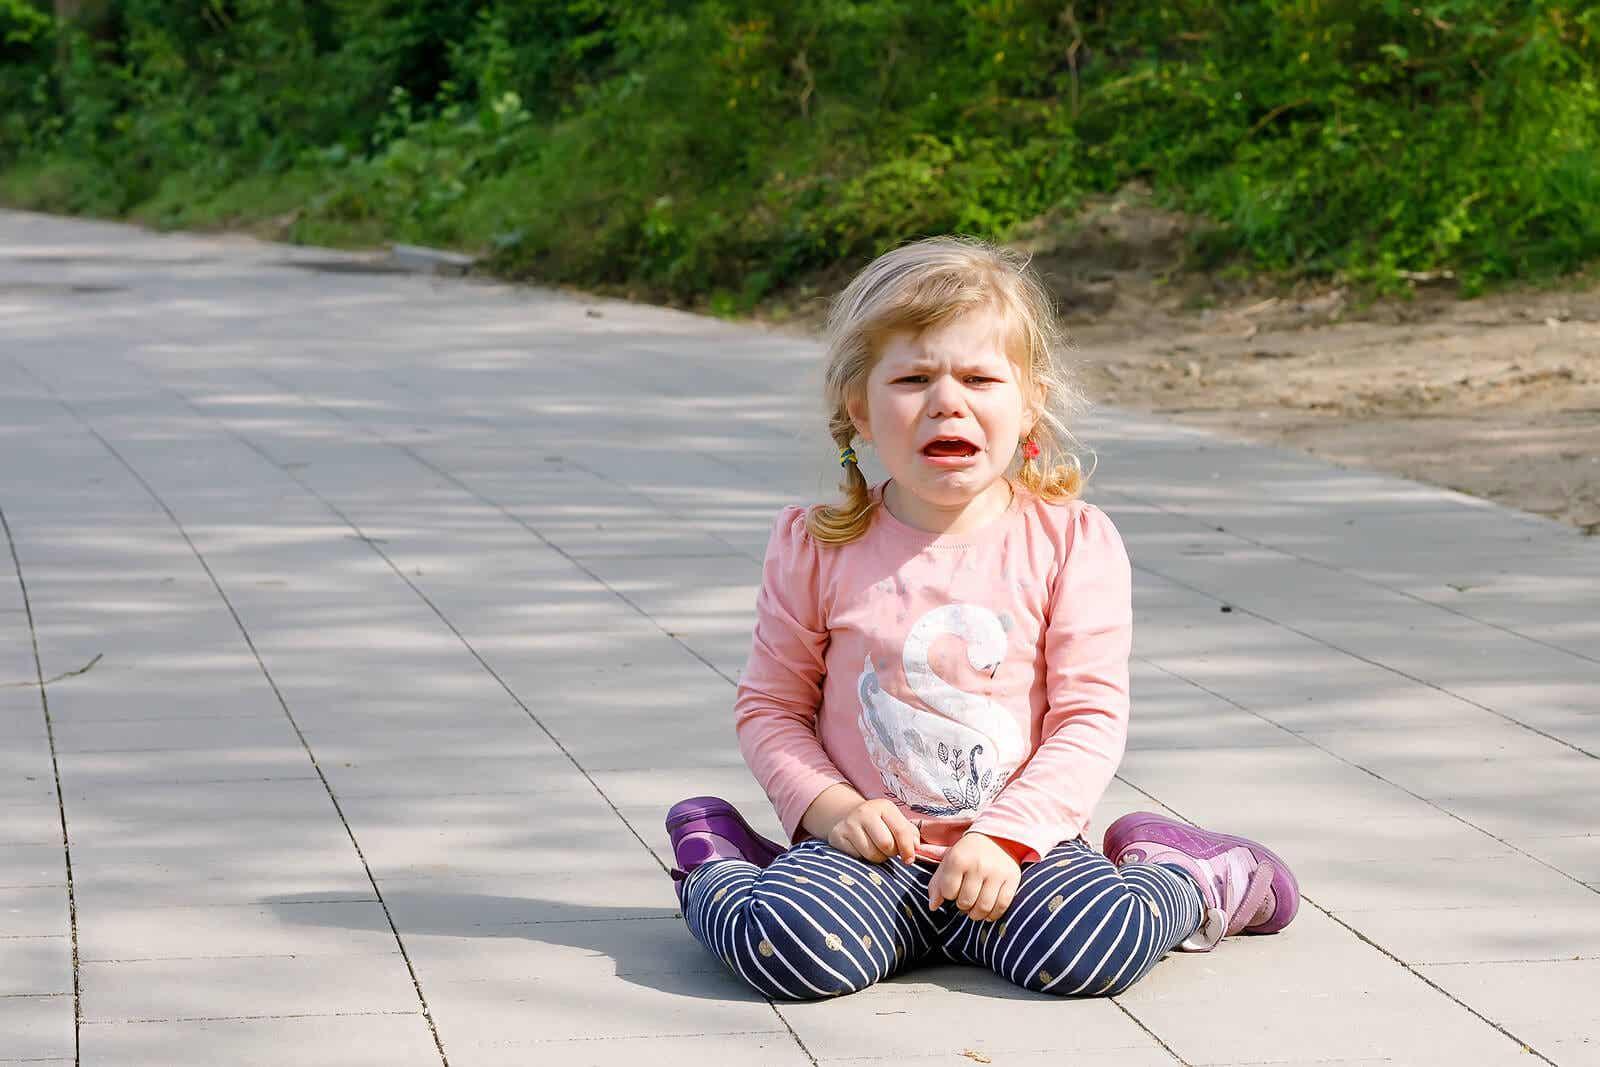 A toddler girl having a tantrum on the sidewalk.